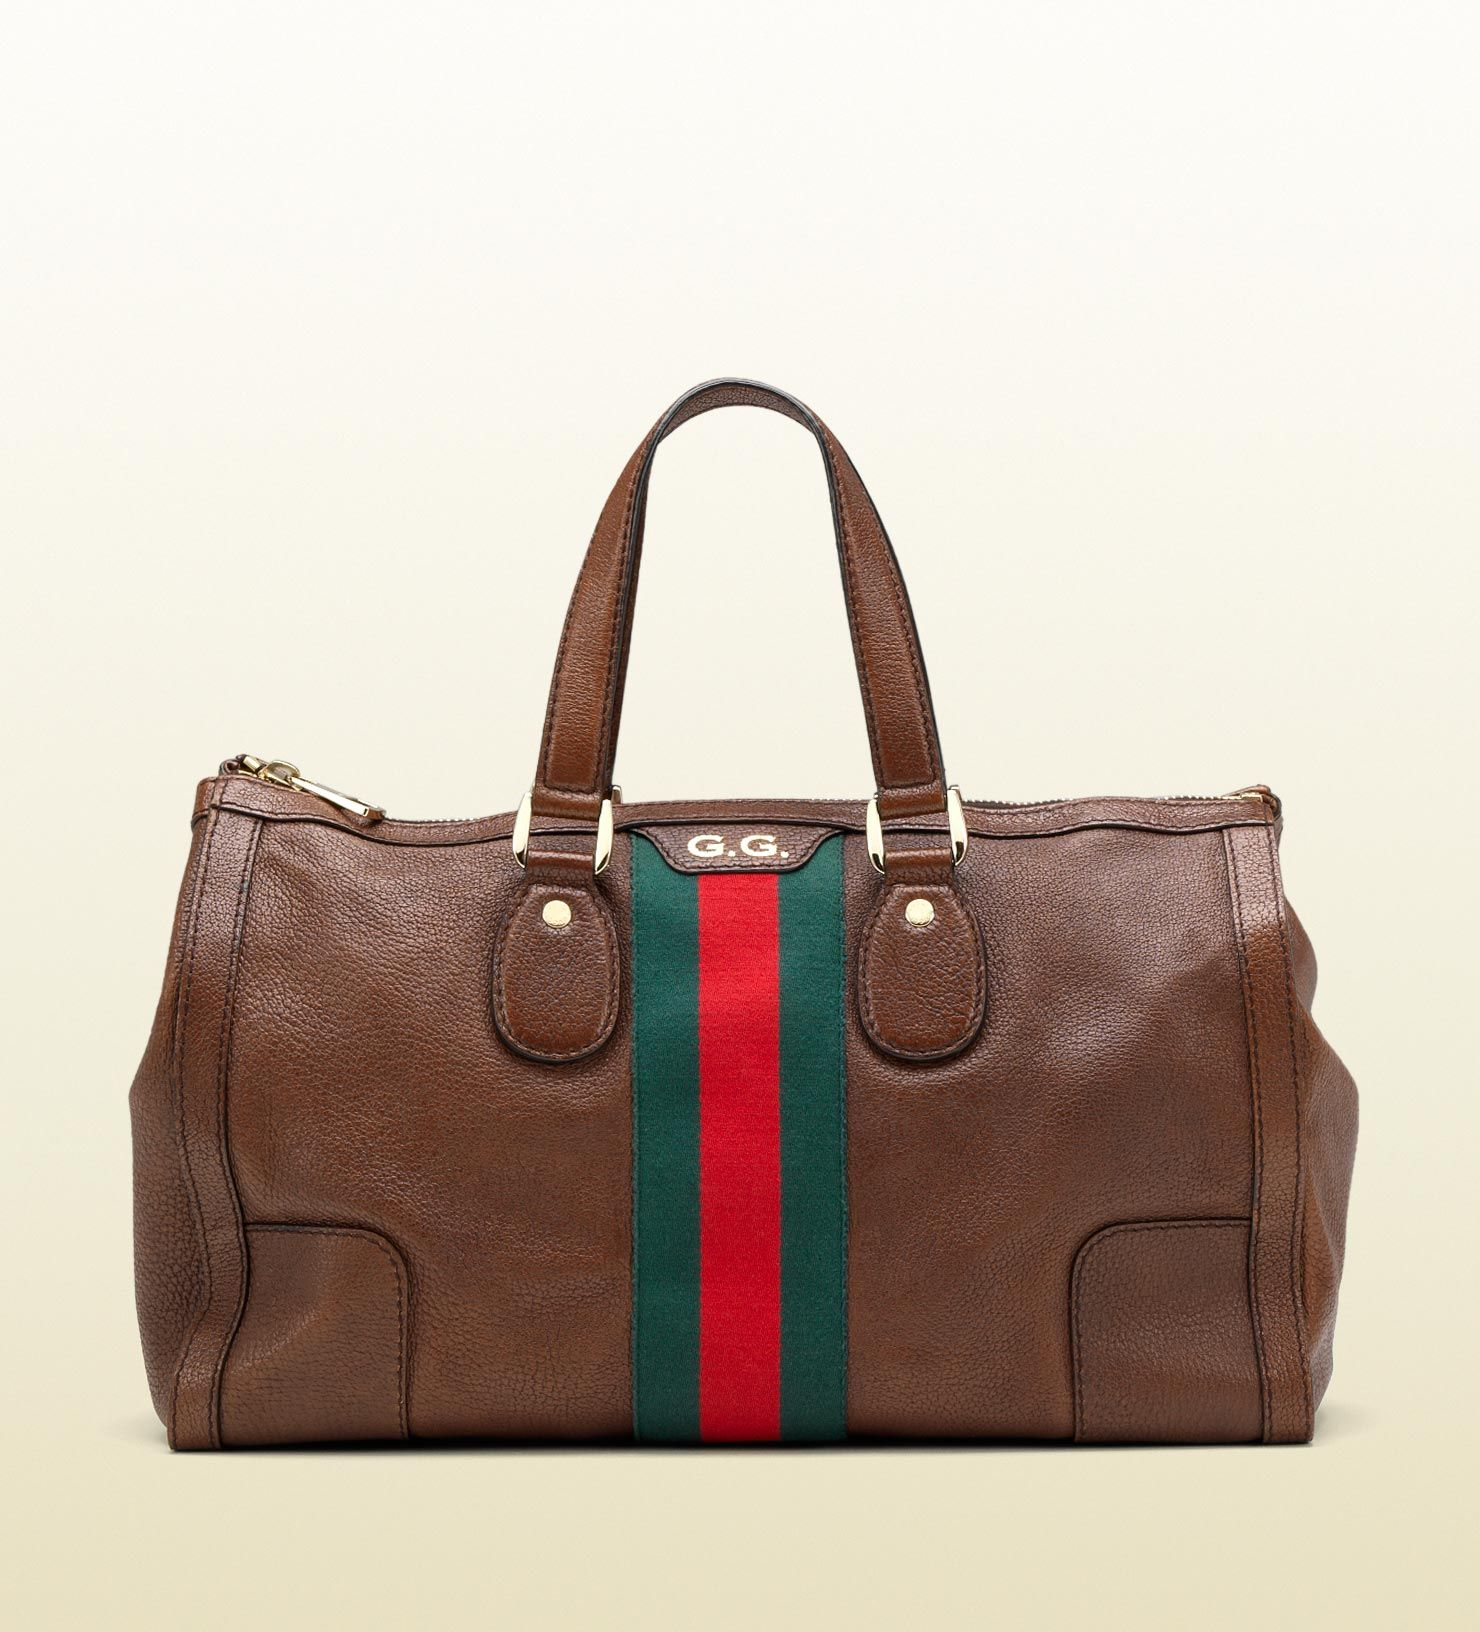 Gucci seventies medium tote with signature web